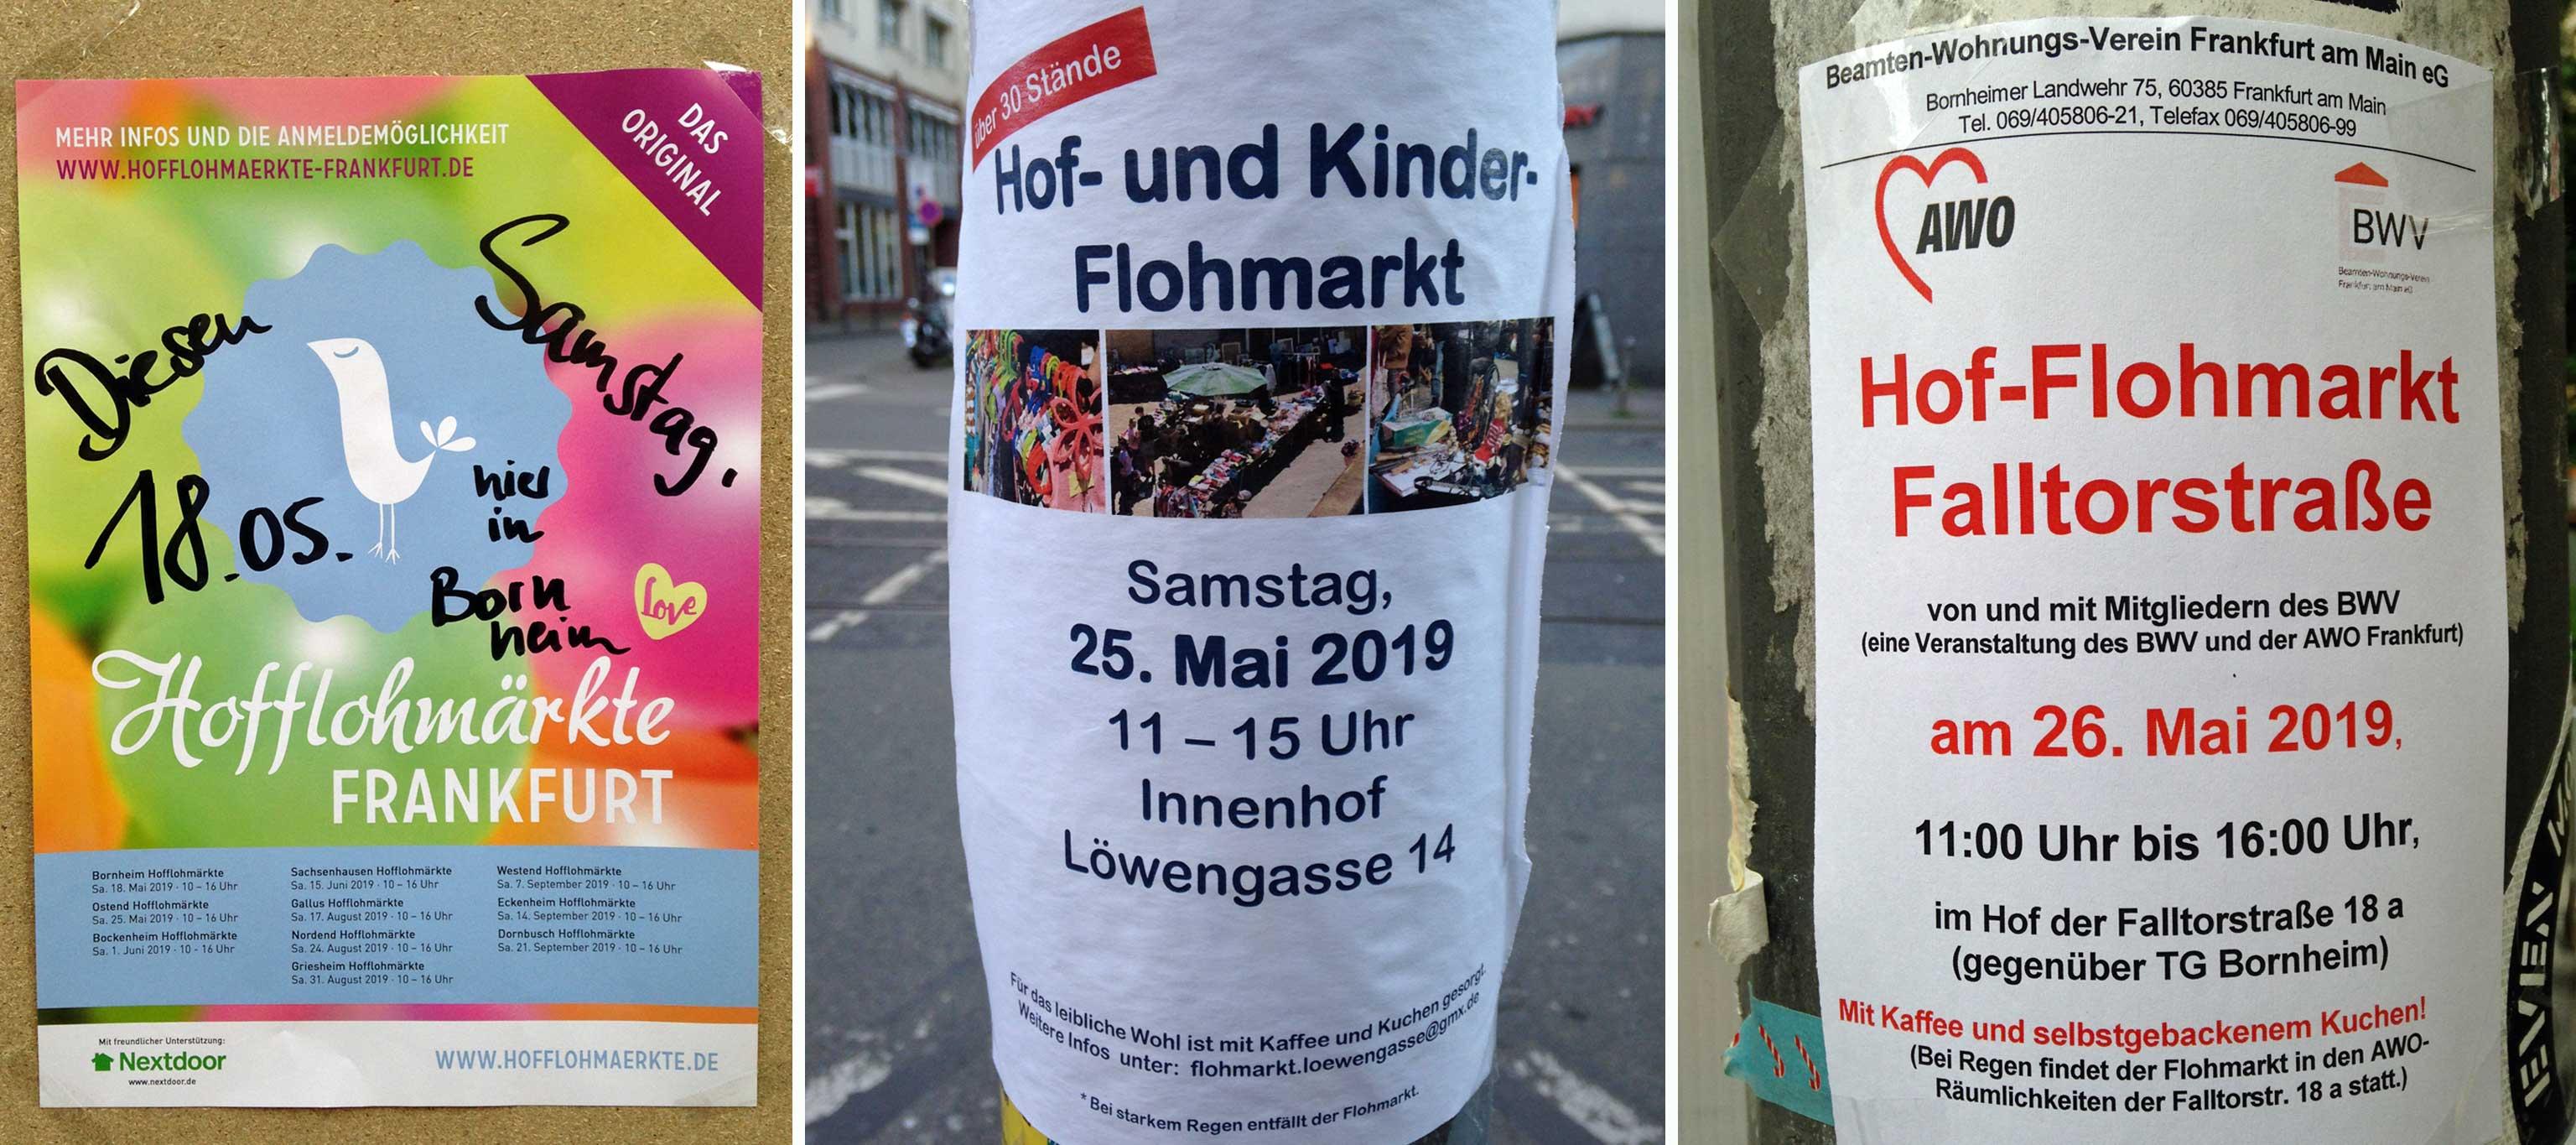 Hof-Flohmärkte in Frankfurt-Bornheim 2019